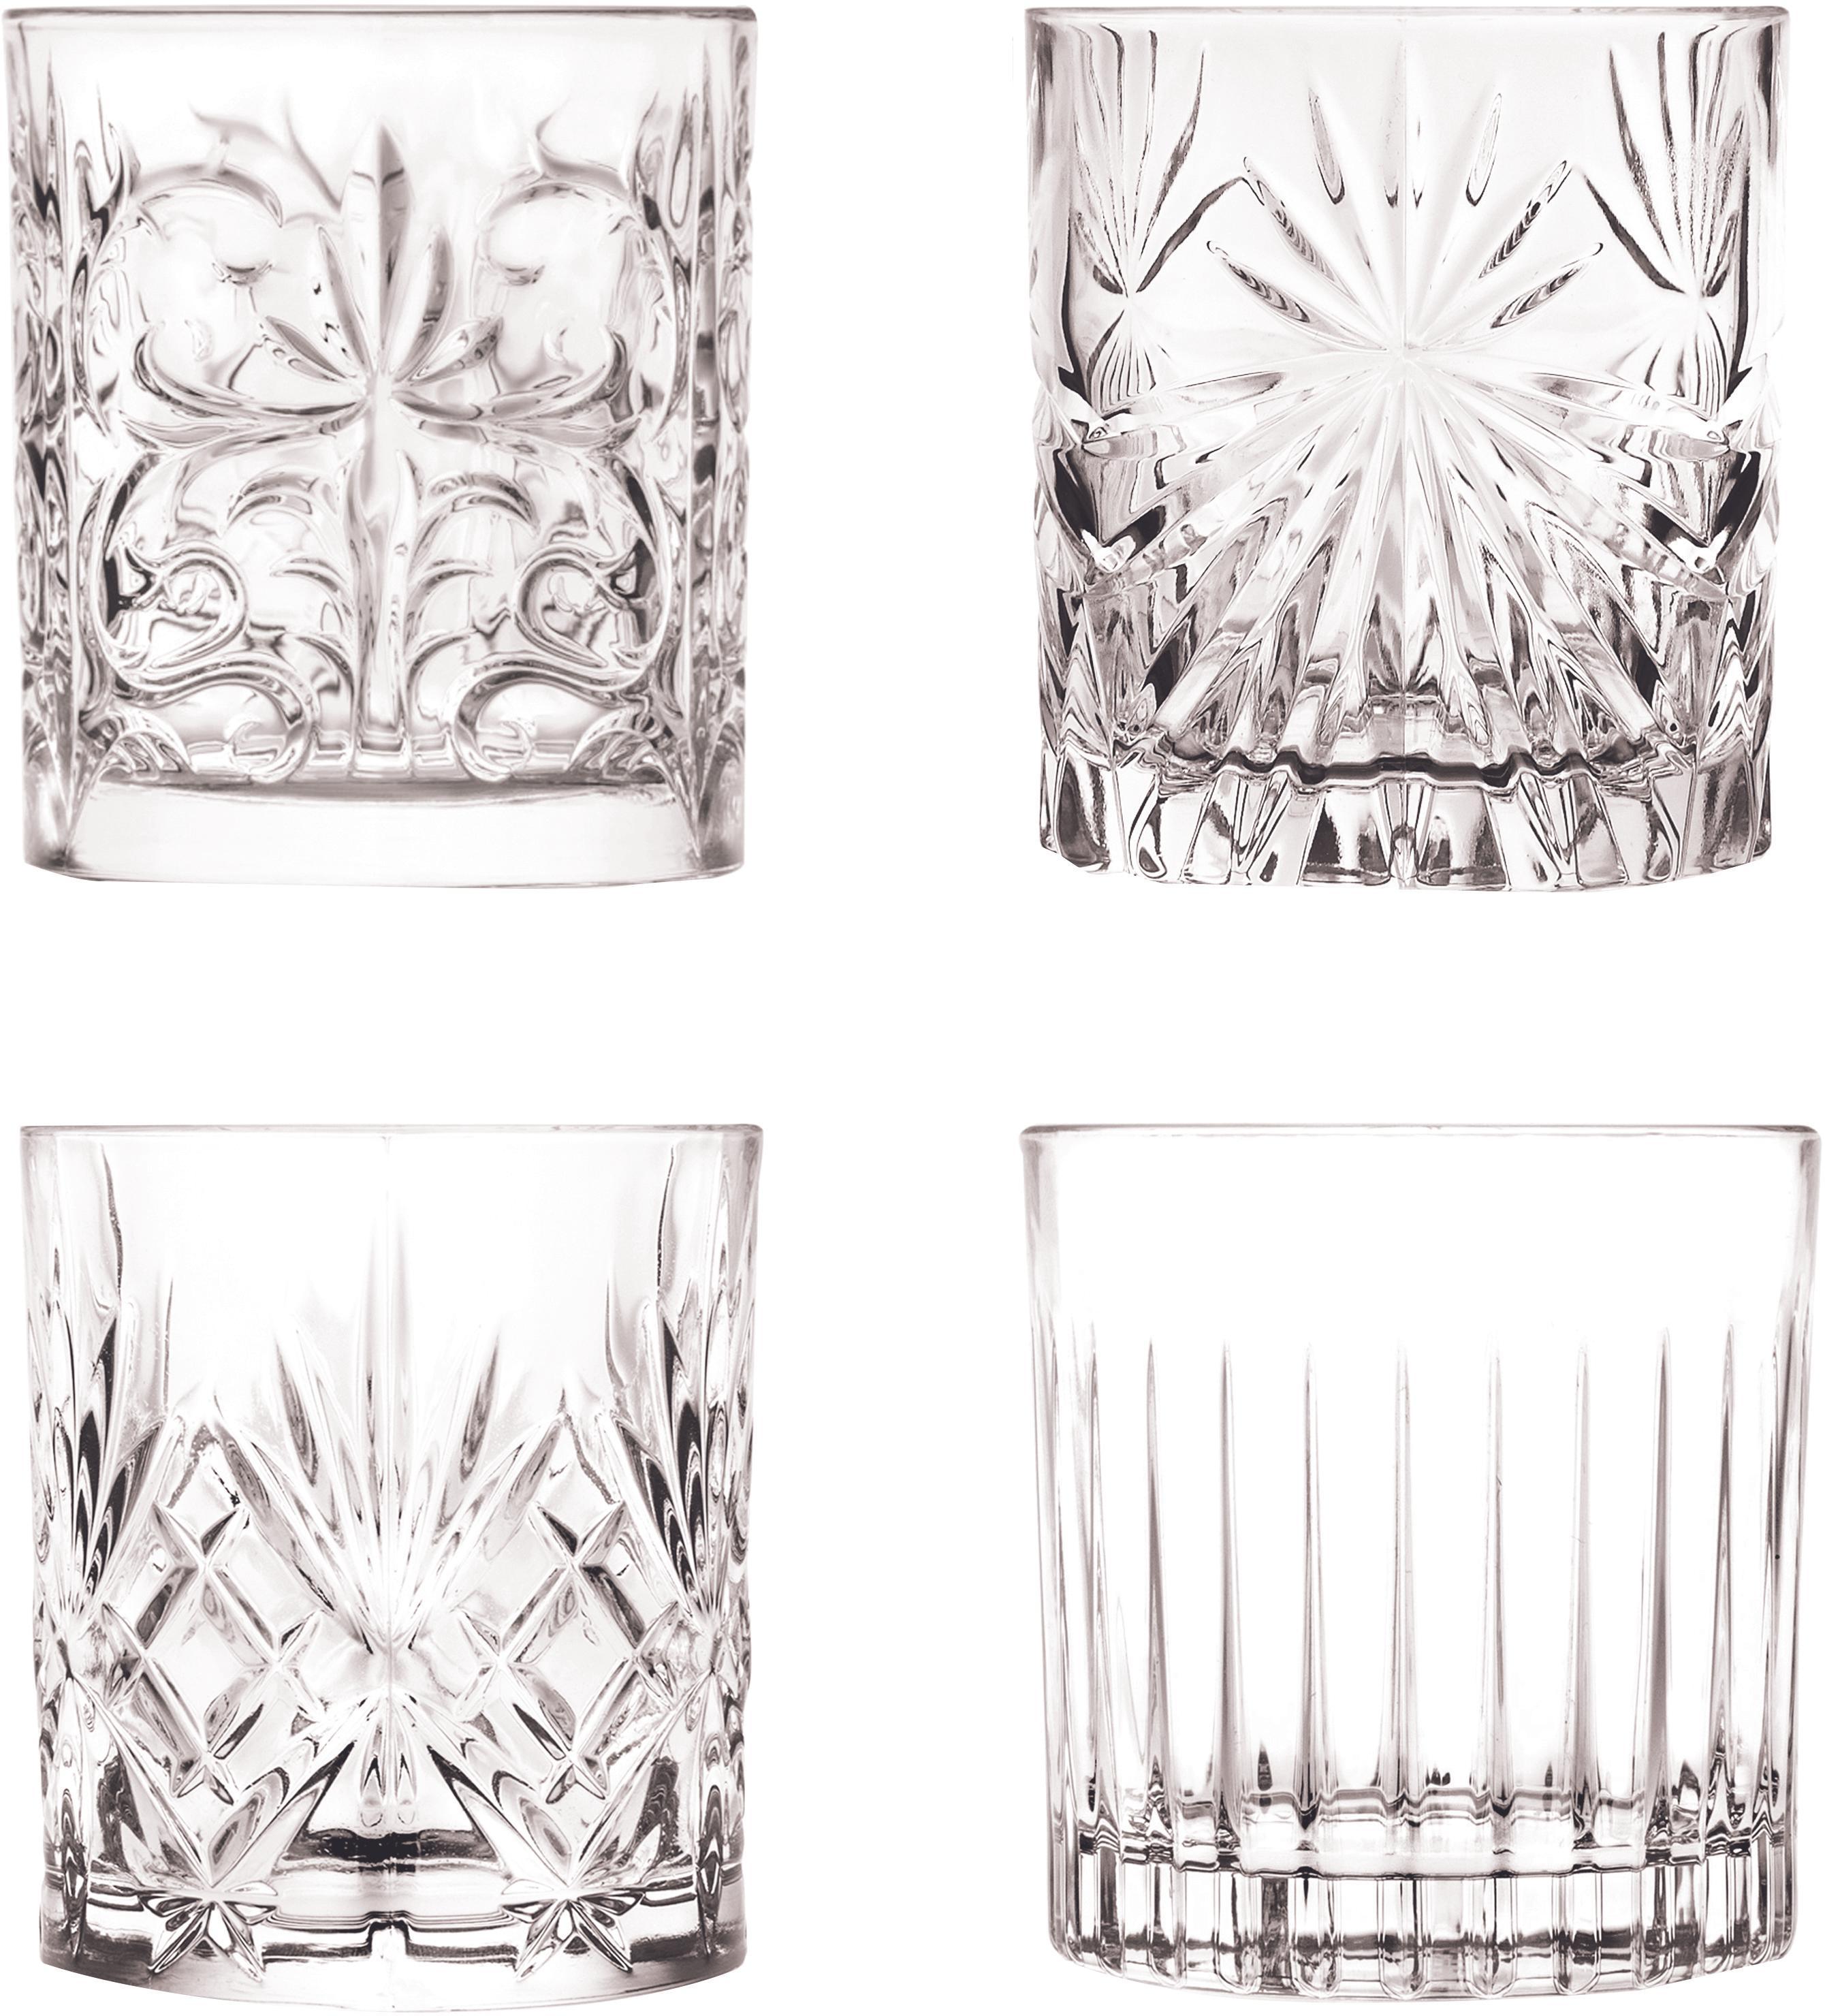 Kryształowy komplet szklanek do whisky Bichiera, 4 elem., Szkło kryształowe, Transparentny, Ø 8 x W 9 cm